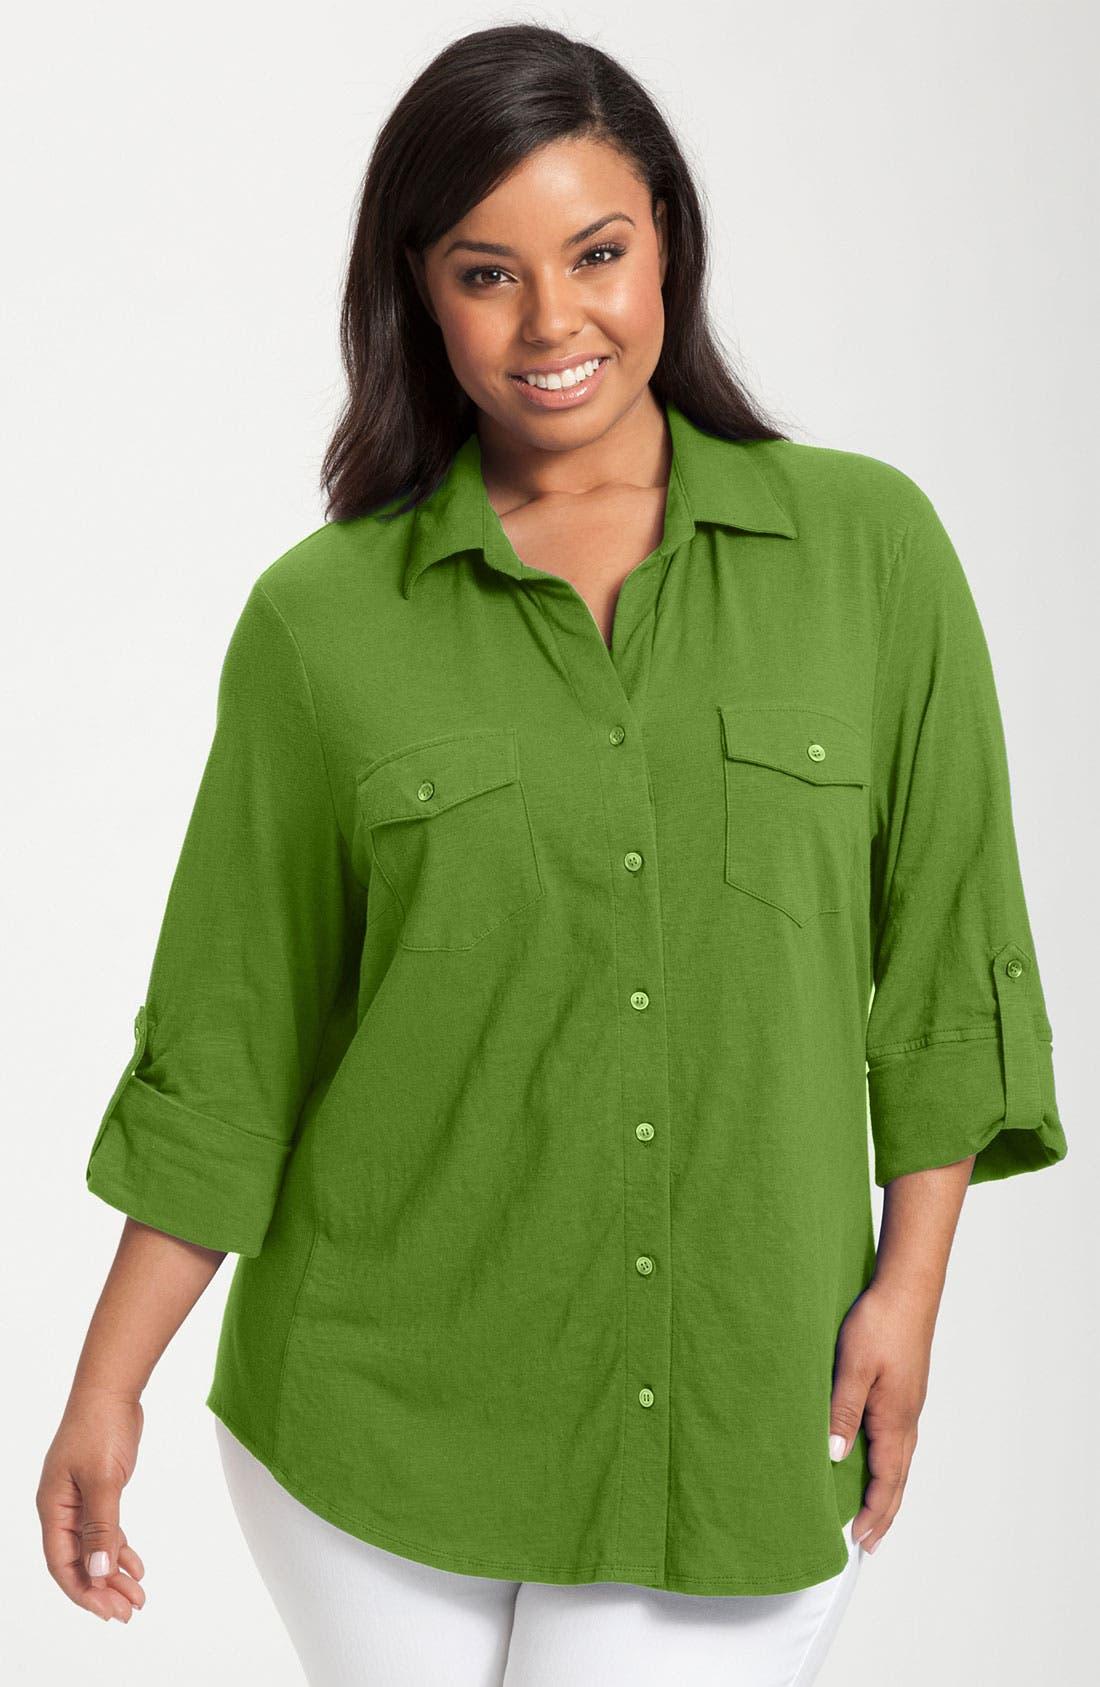 Alternate Image 1 Selected - Sandra Ingrish Roll Sleeve Knit Shirt (Plus Size)